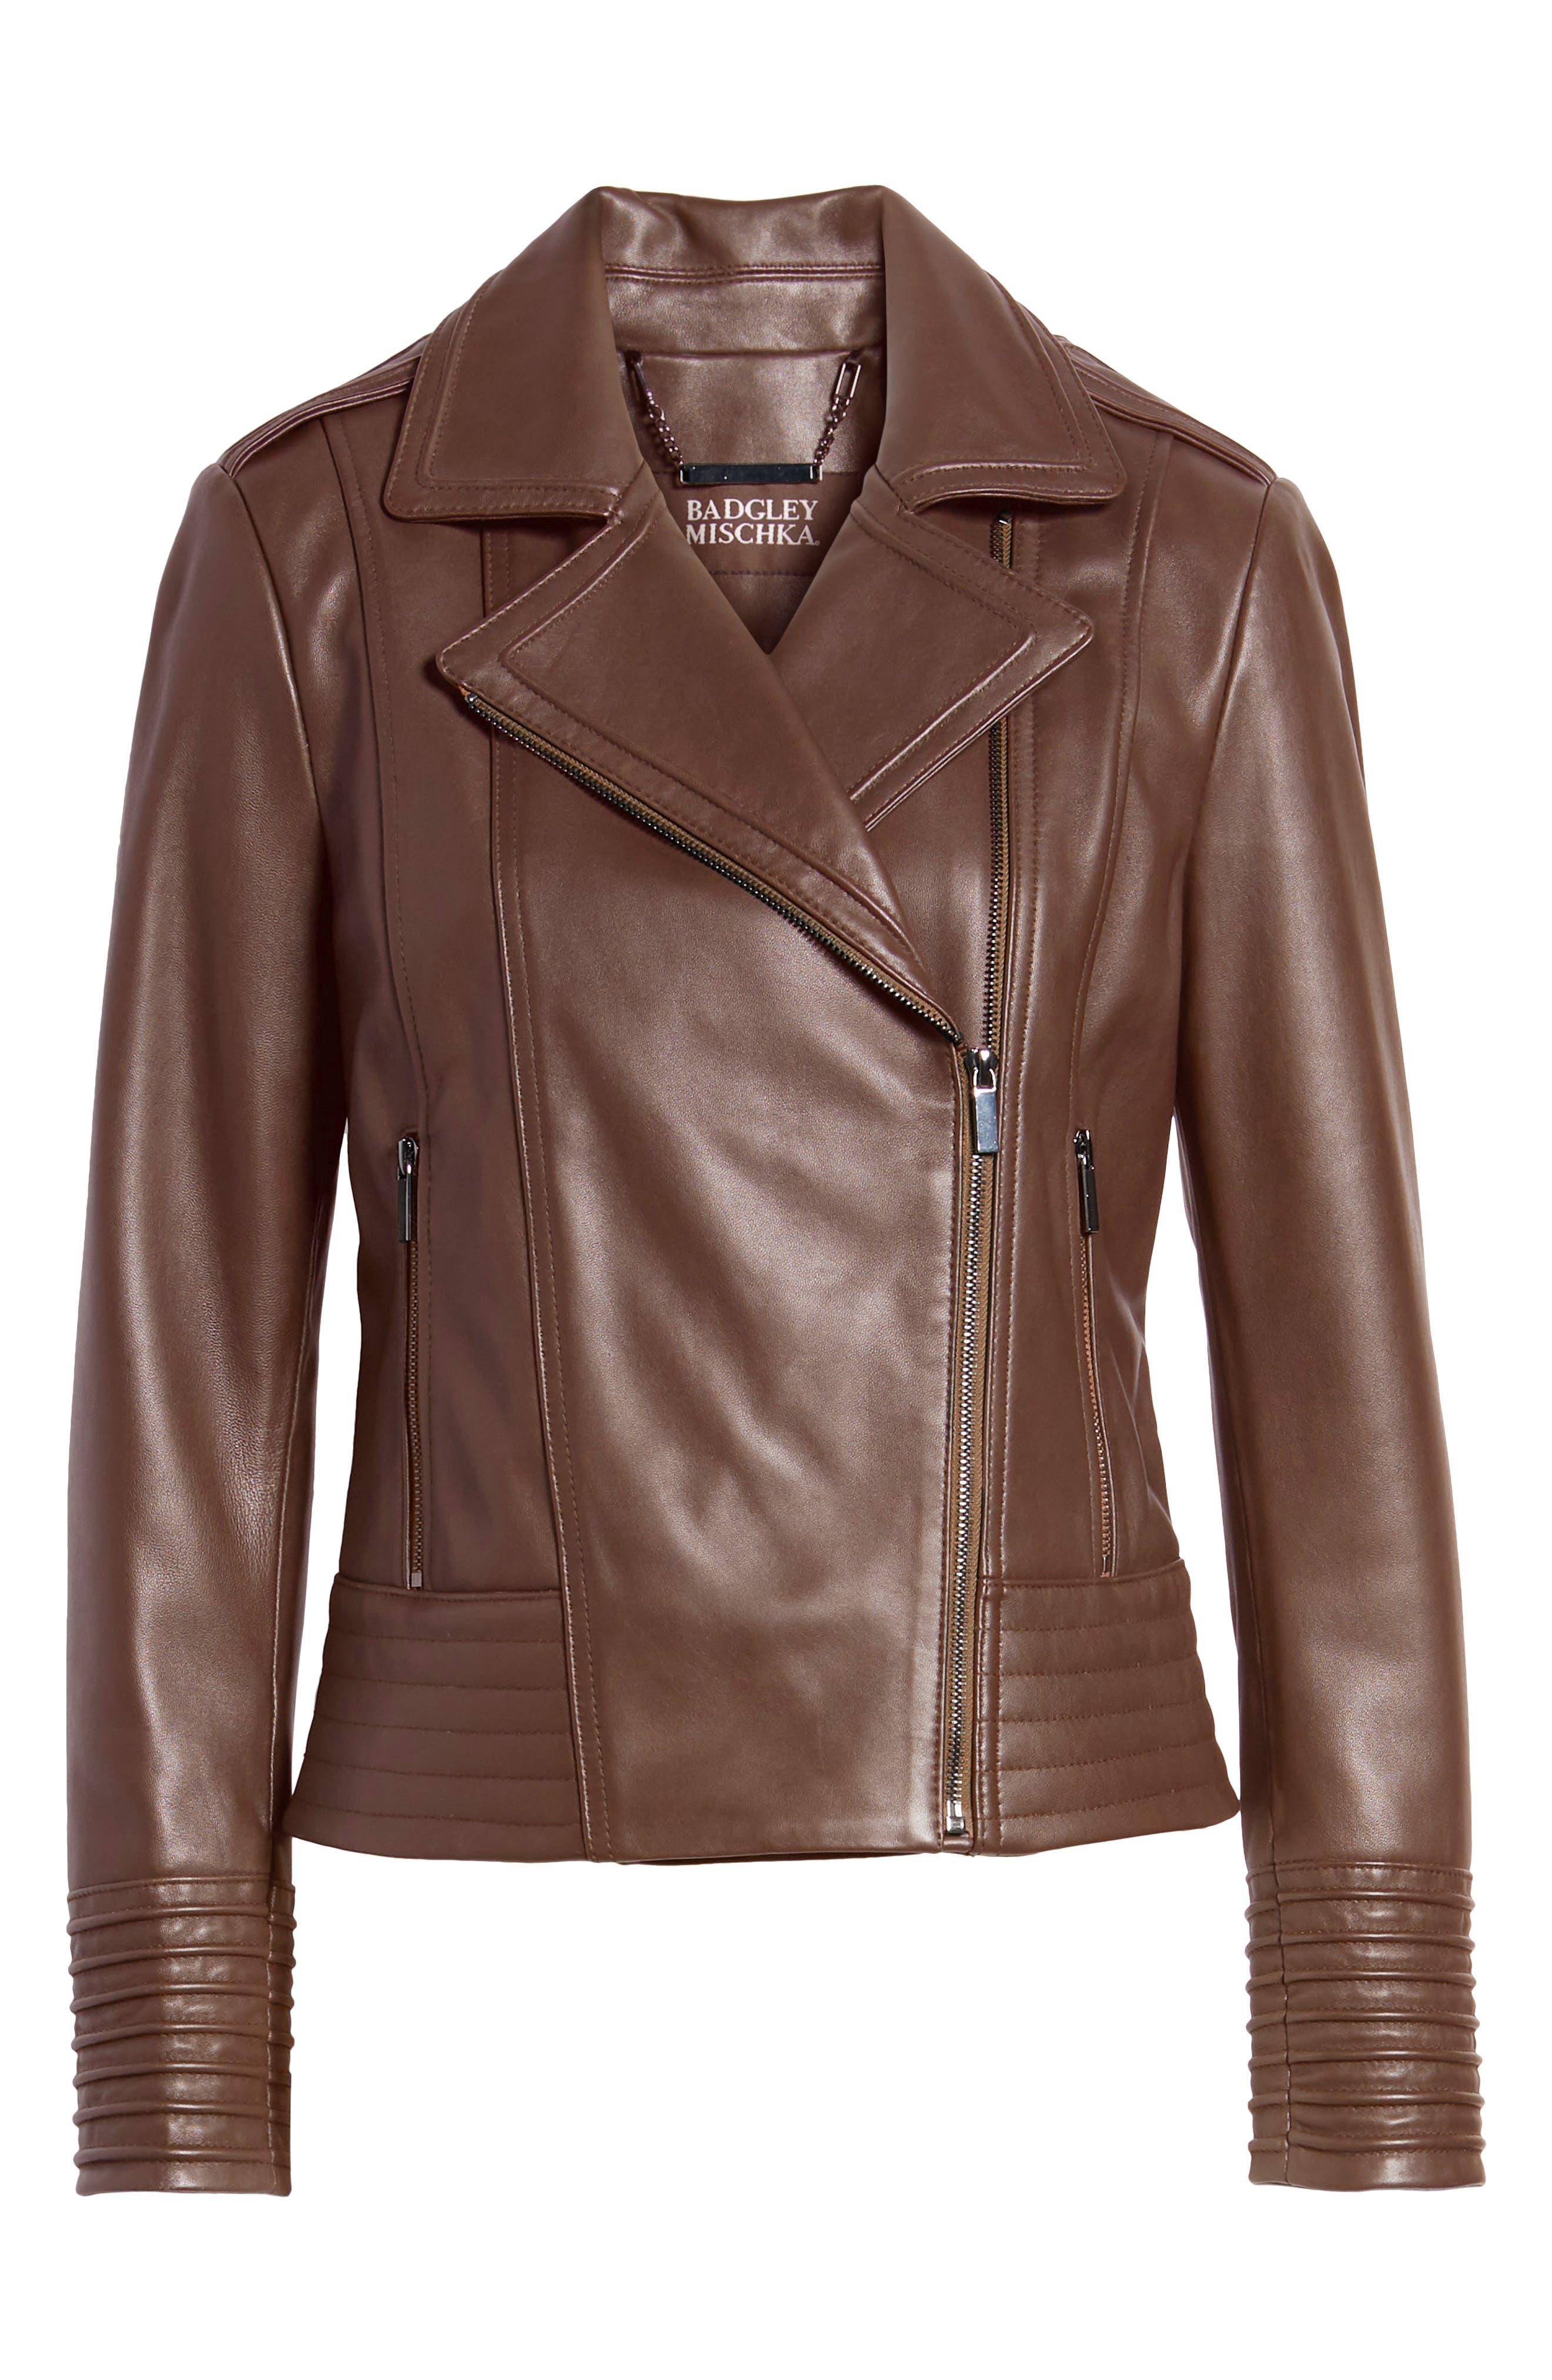 BADGLEY MISCHKA COLLECTION, Badgley Mischka Gia Leather Biker Jacket, Alternate thumbnail 6, color, 201